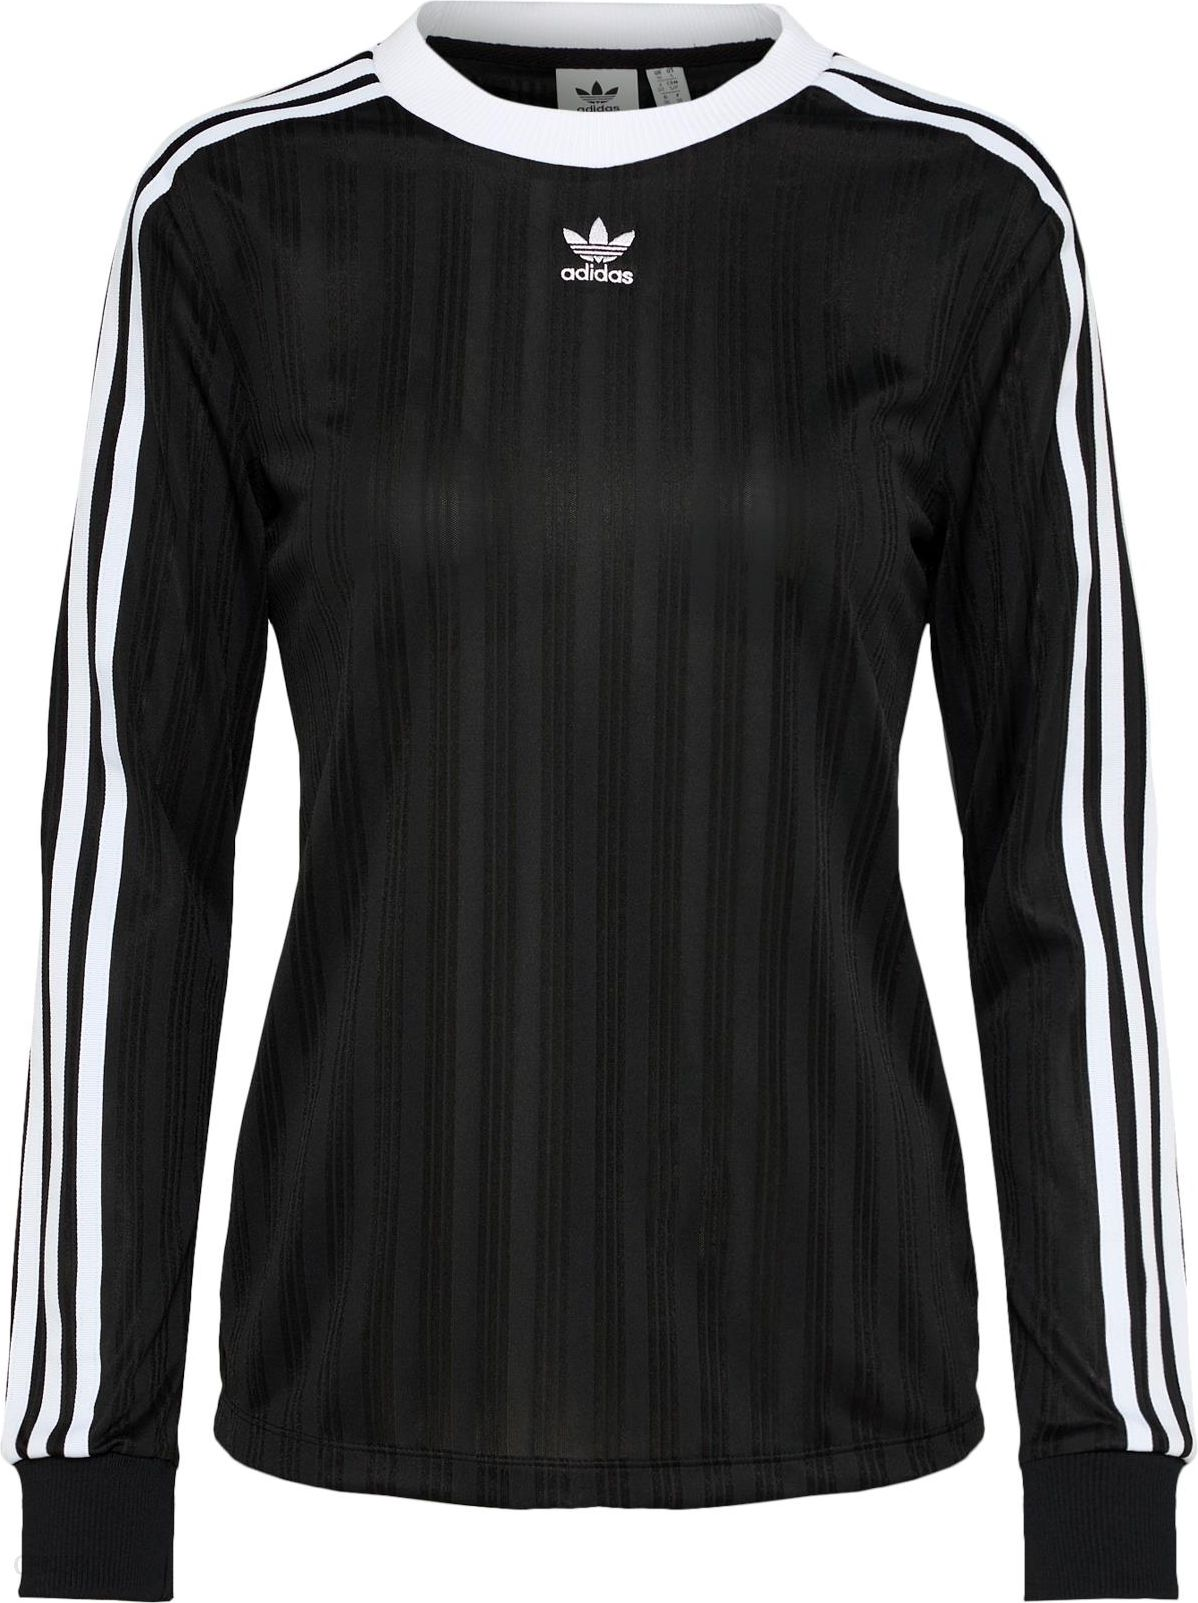 Adidas Originals Damska Koszulka 3 Stripes CzarnyBialy Online